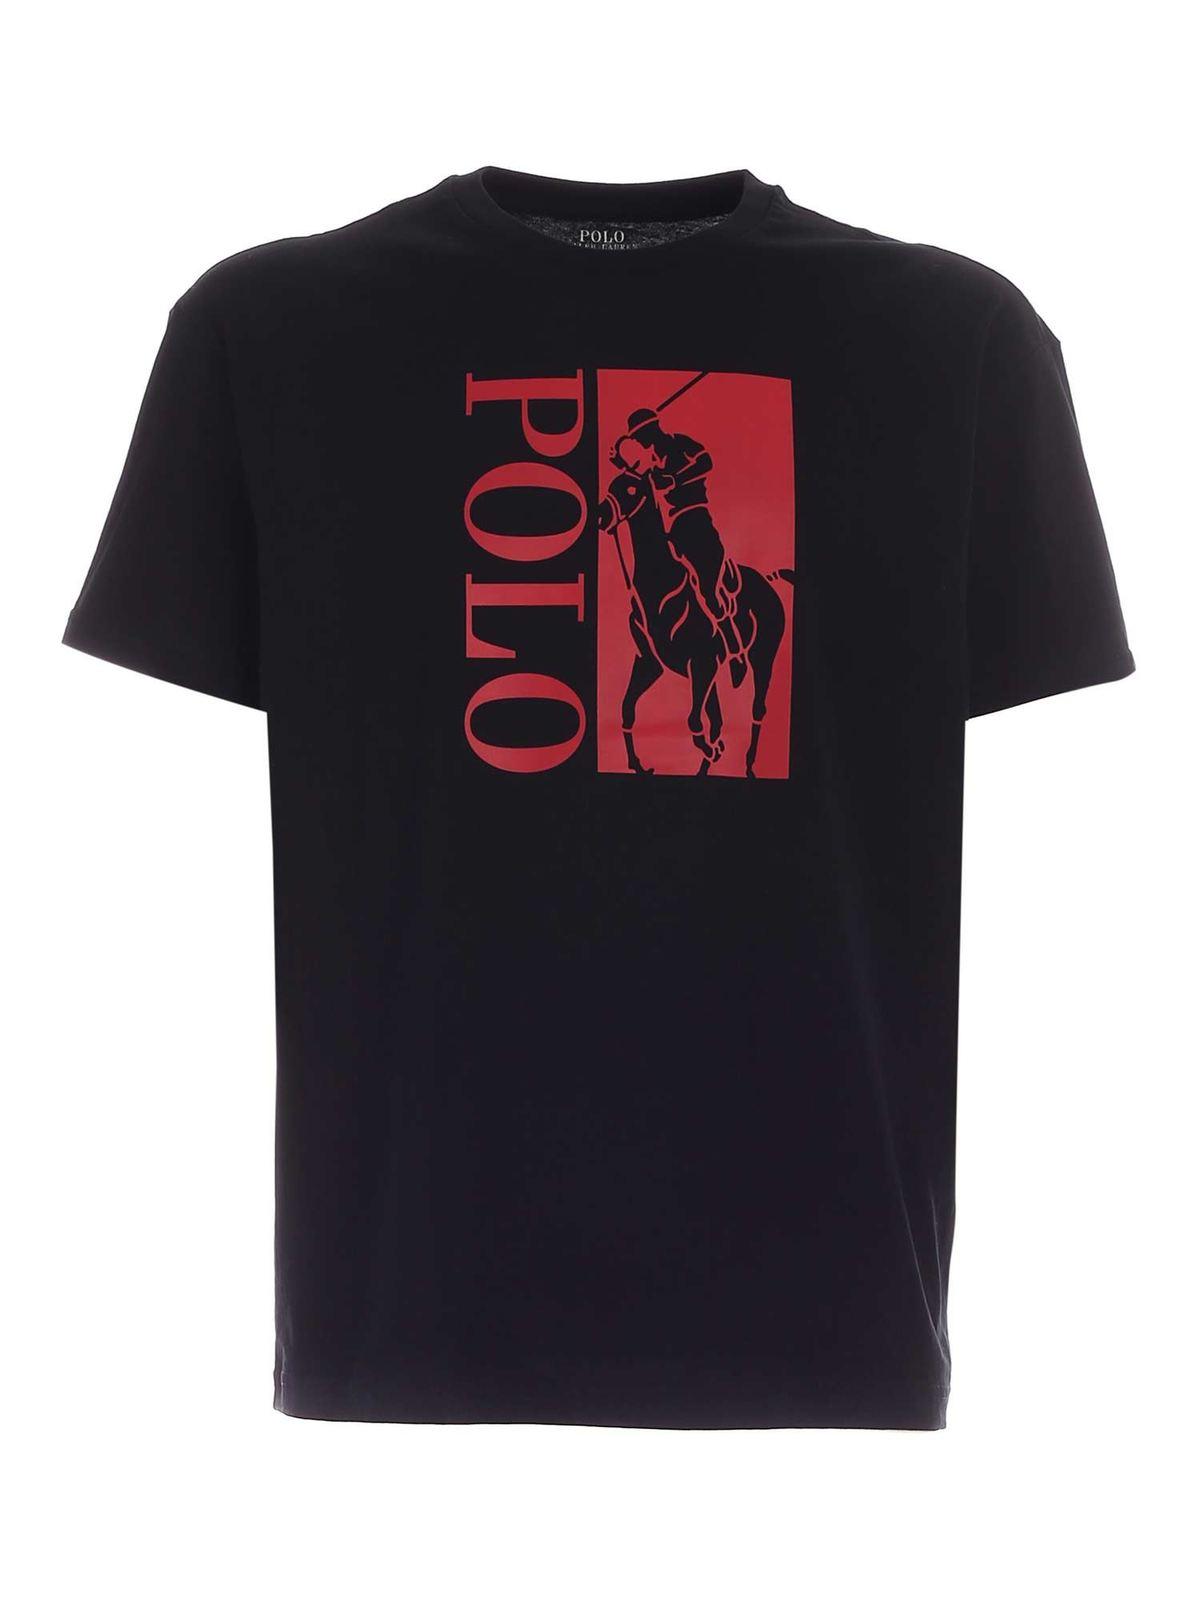 Polo Ralph Lauren RED LOGO PRINT T-SHIRT IN BLACK